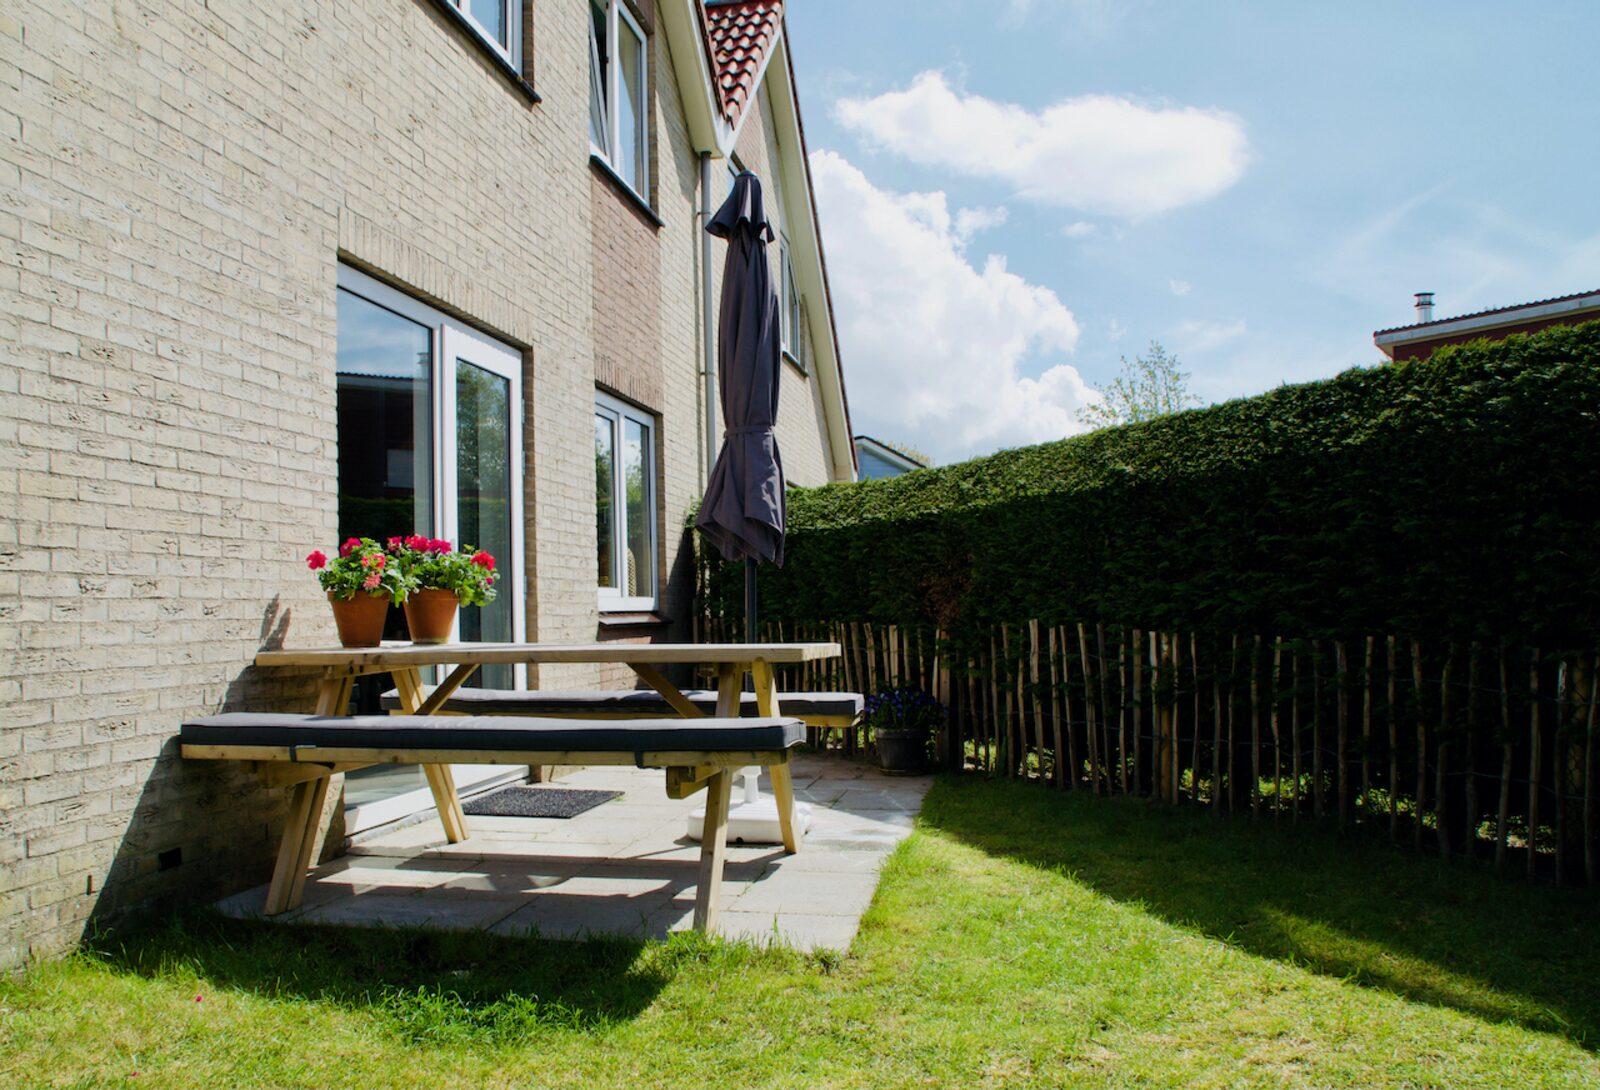 Mosselbank 093 - Noordzeepark Ouddorp